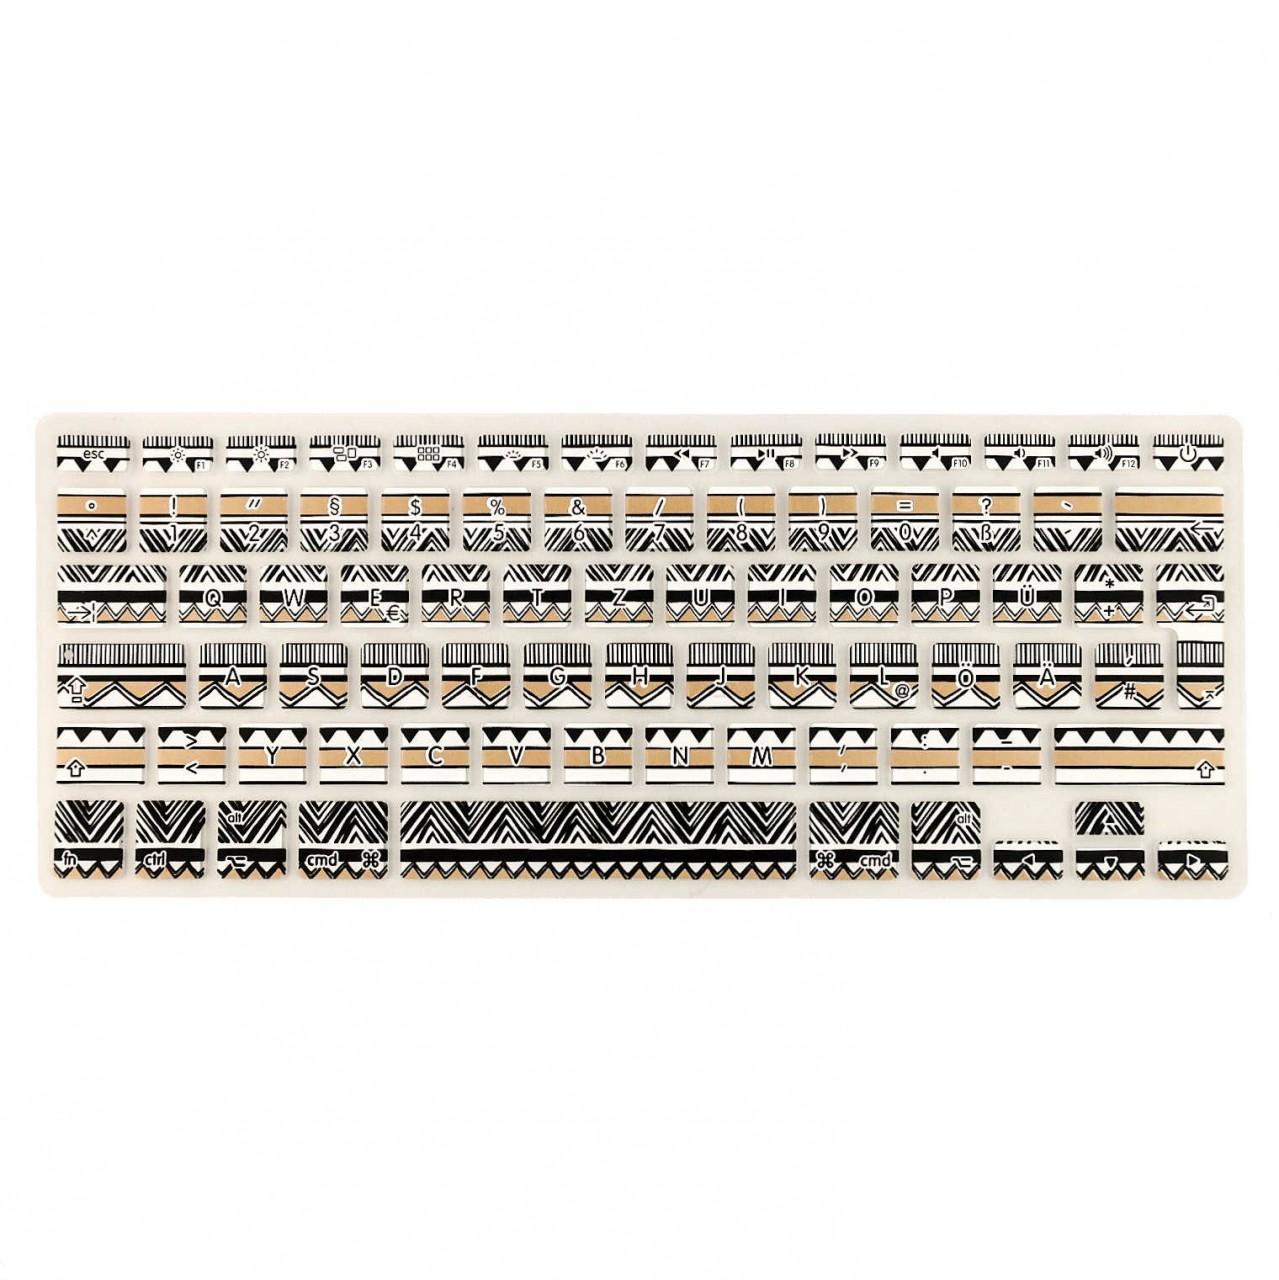 Silikonhülle für Tastaturen Ards Buick 1